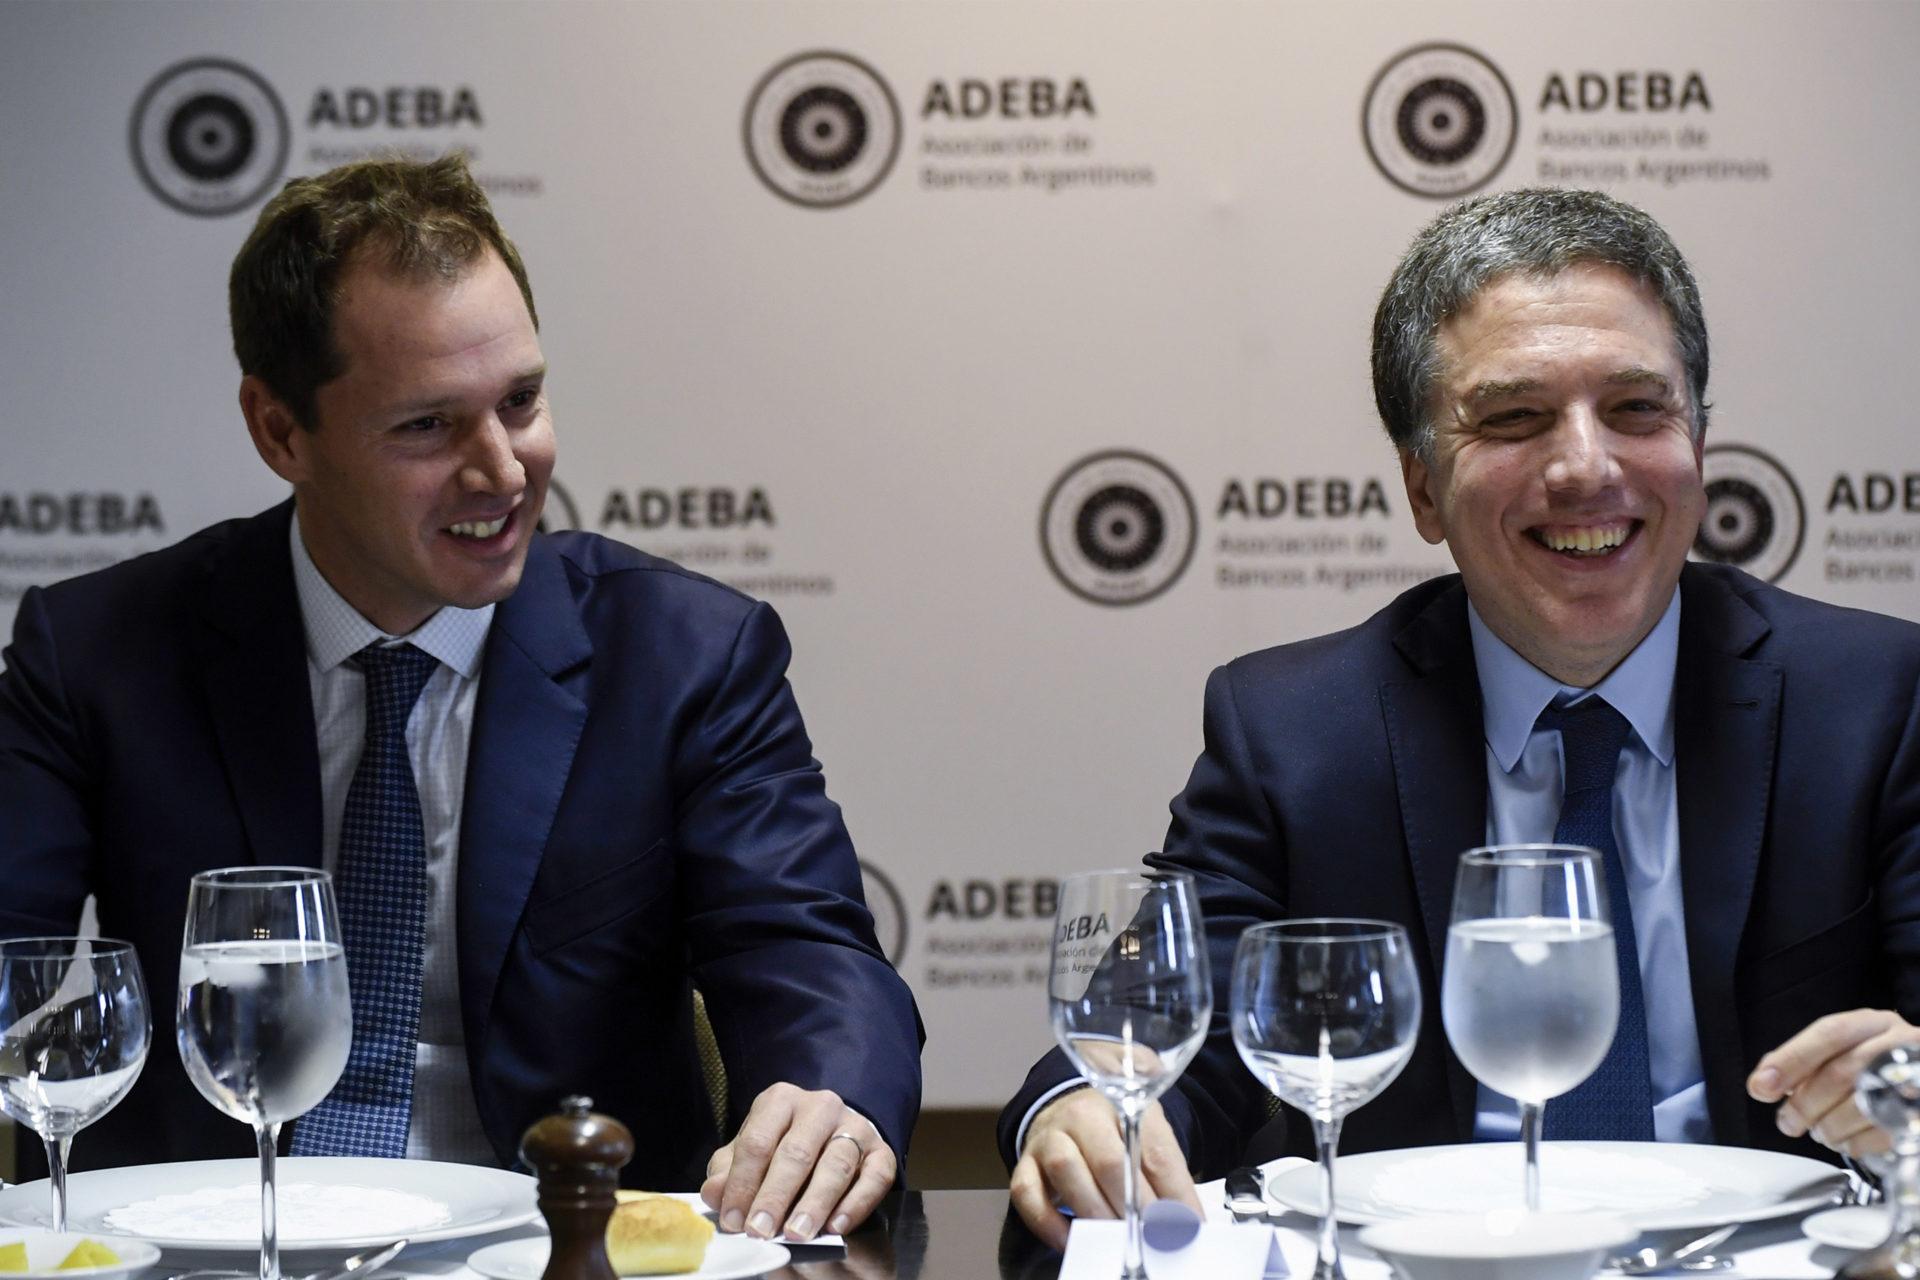 Dujovne se reunió con las autoridades de ADEBA